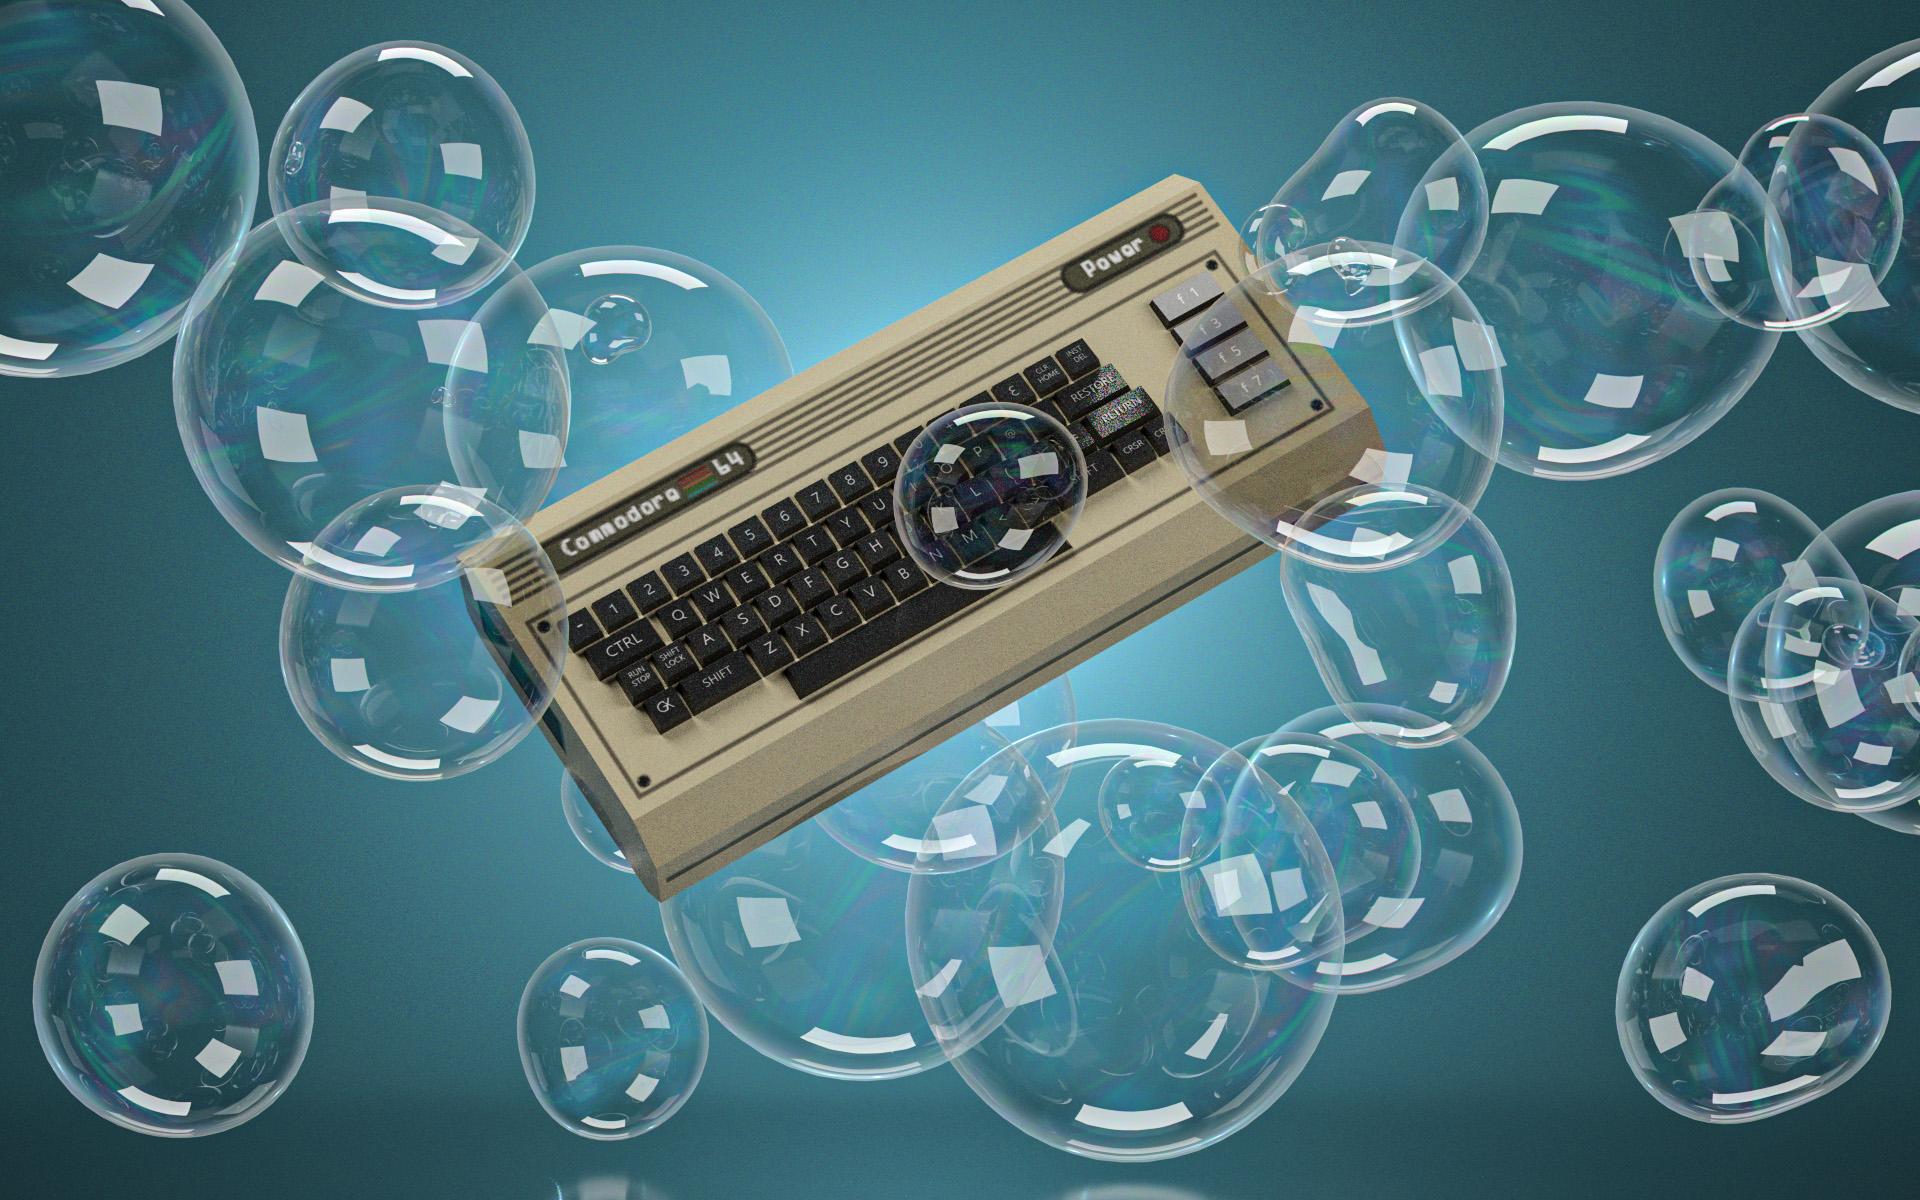 Bubbles_C64.jpg